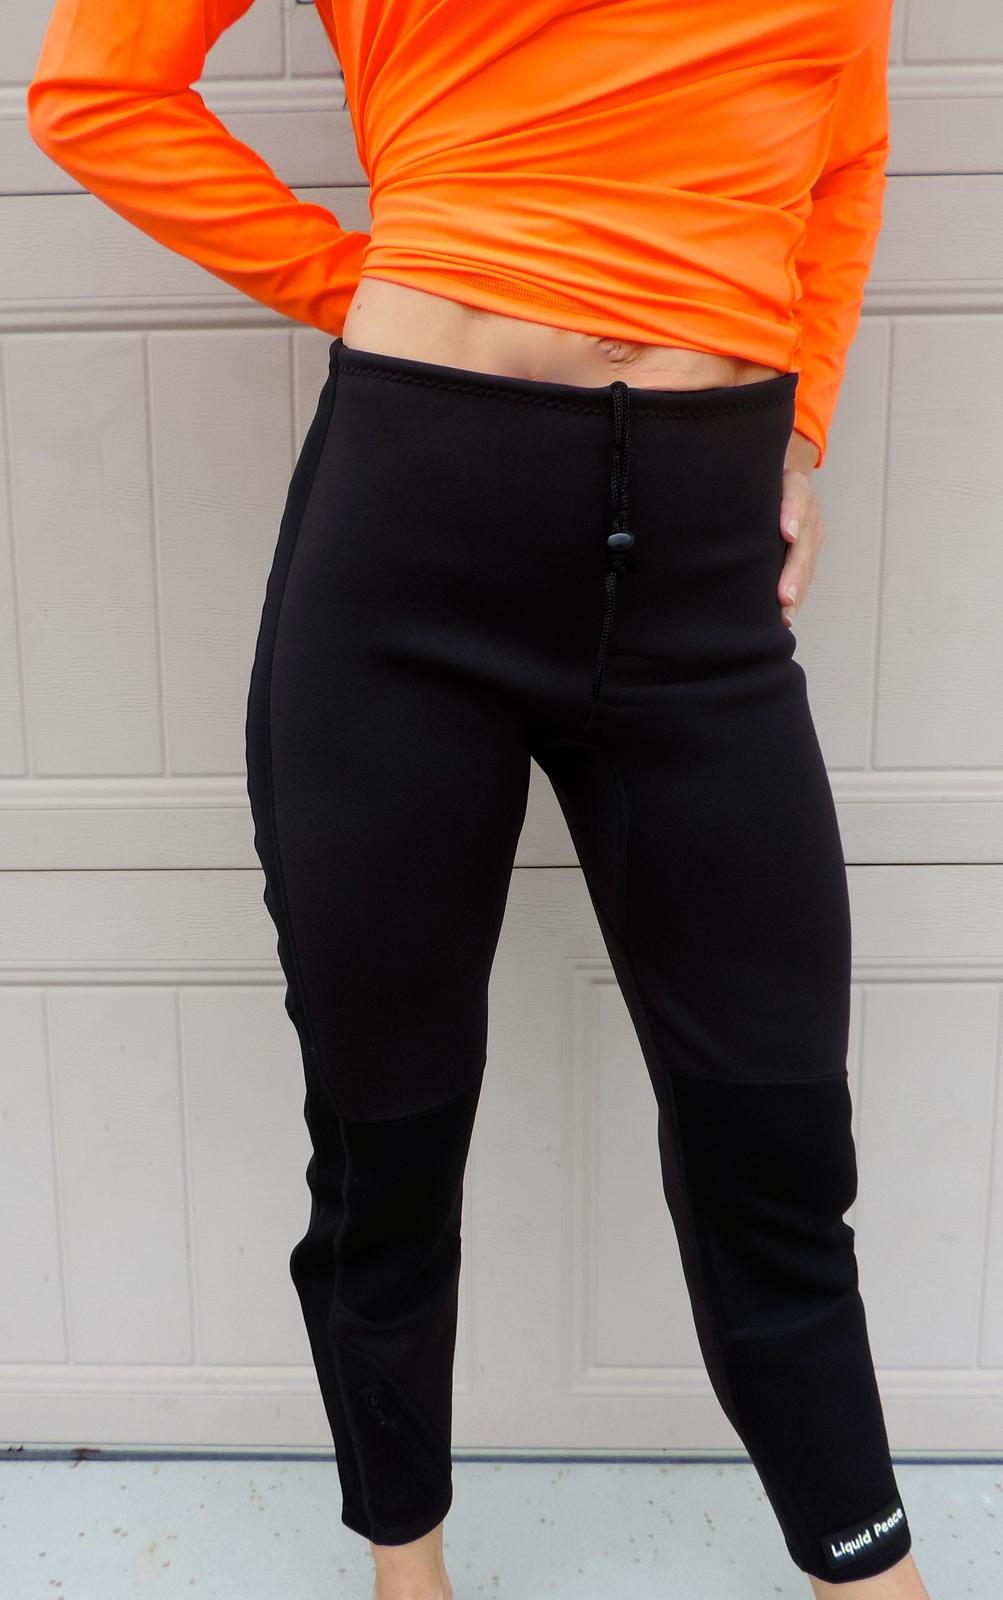 Women s wetsuit pants